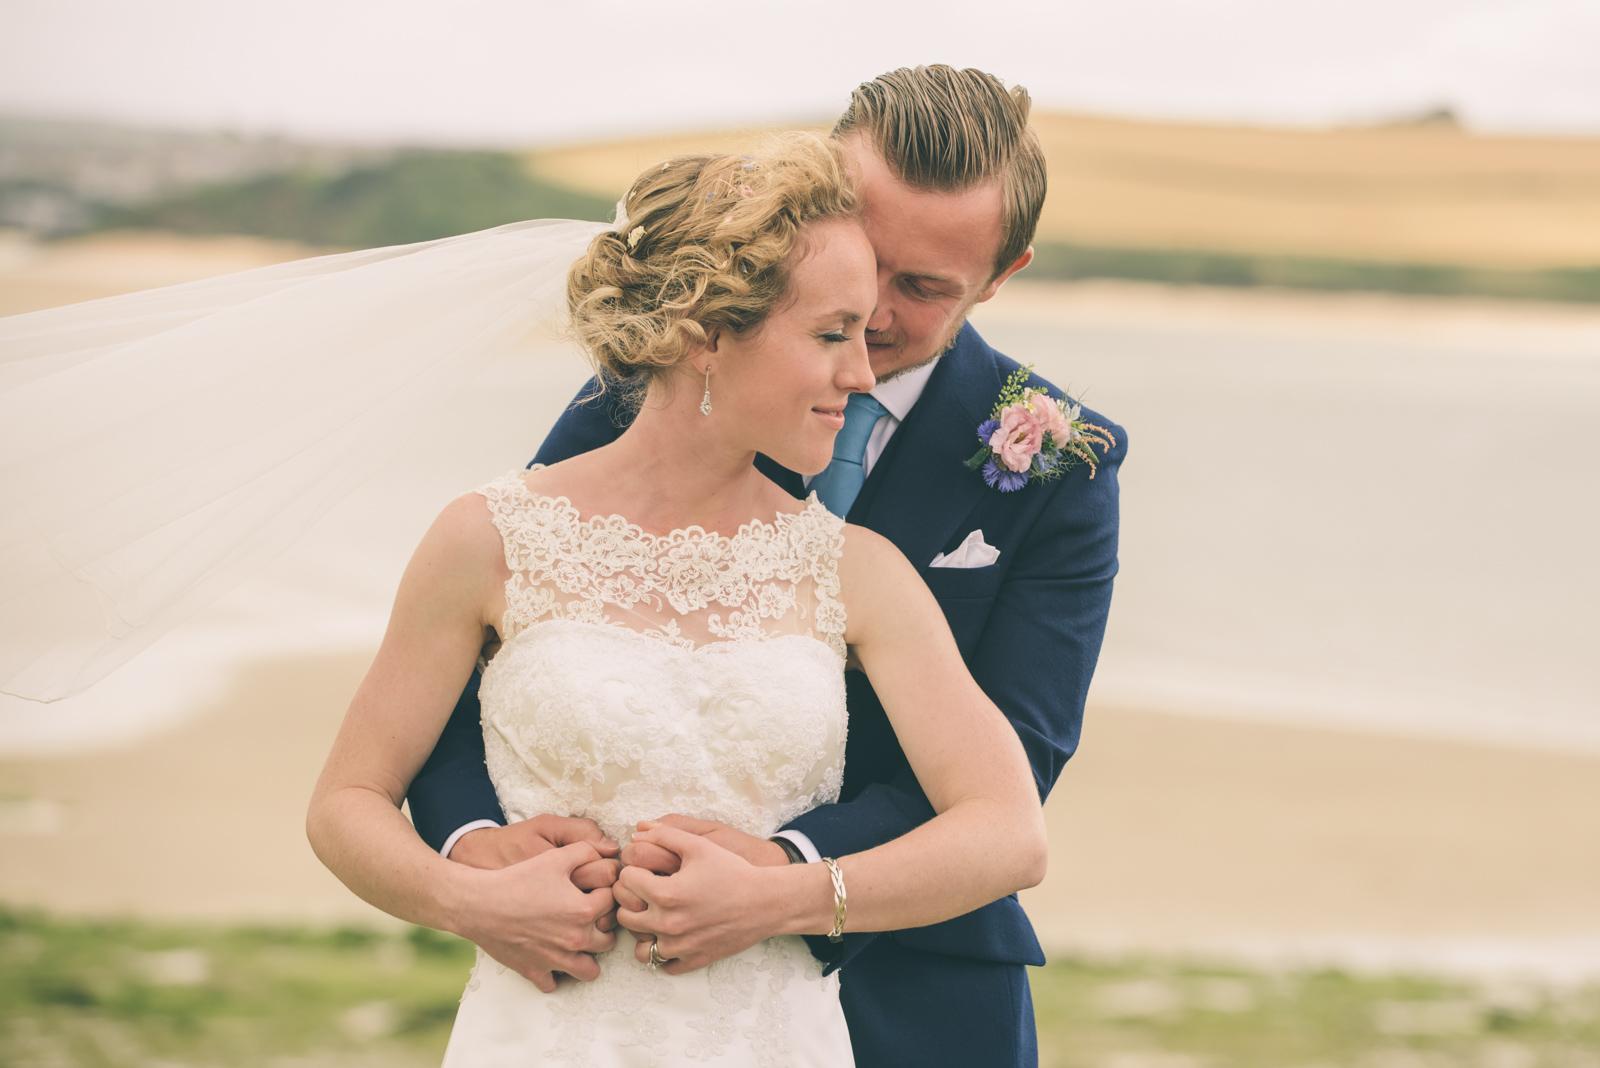 wedding-photography-rock-183.jpg